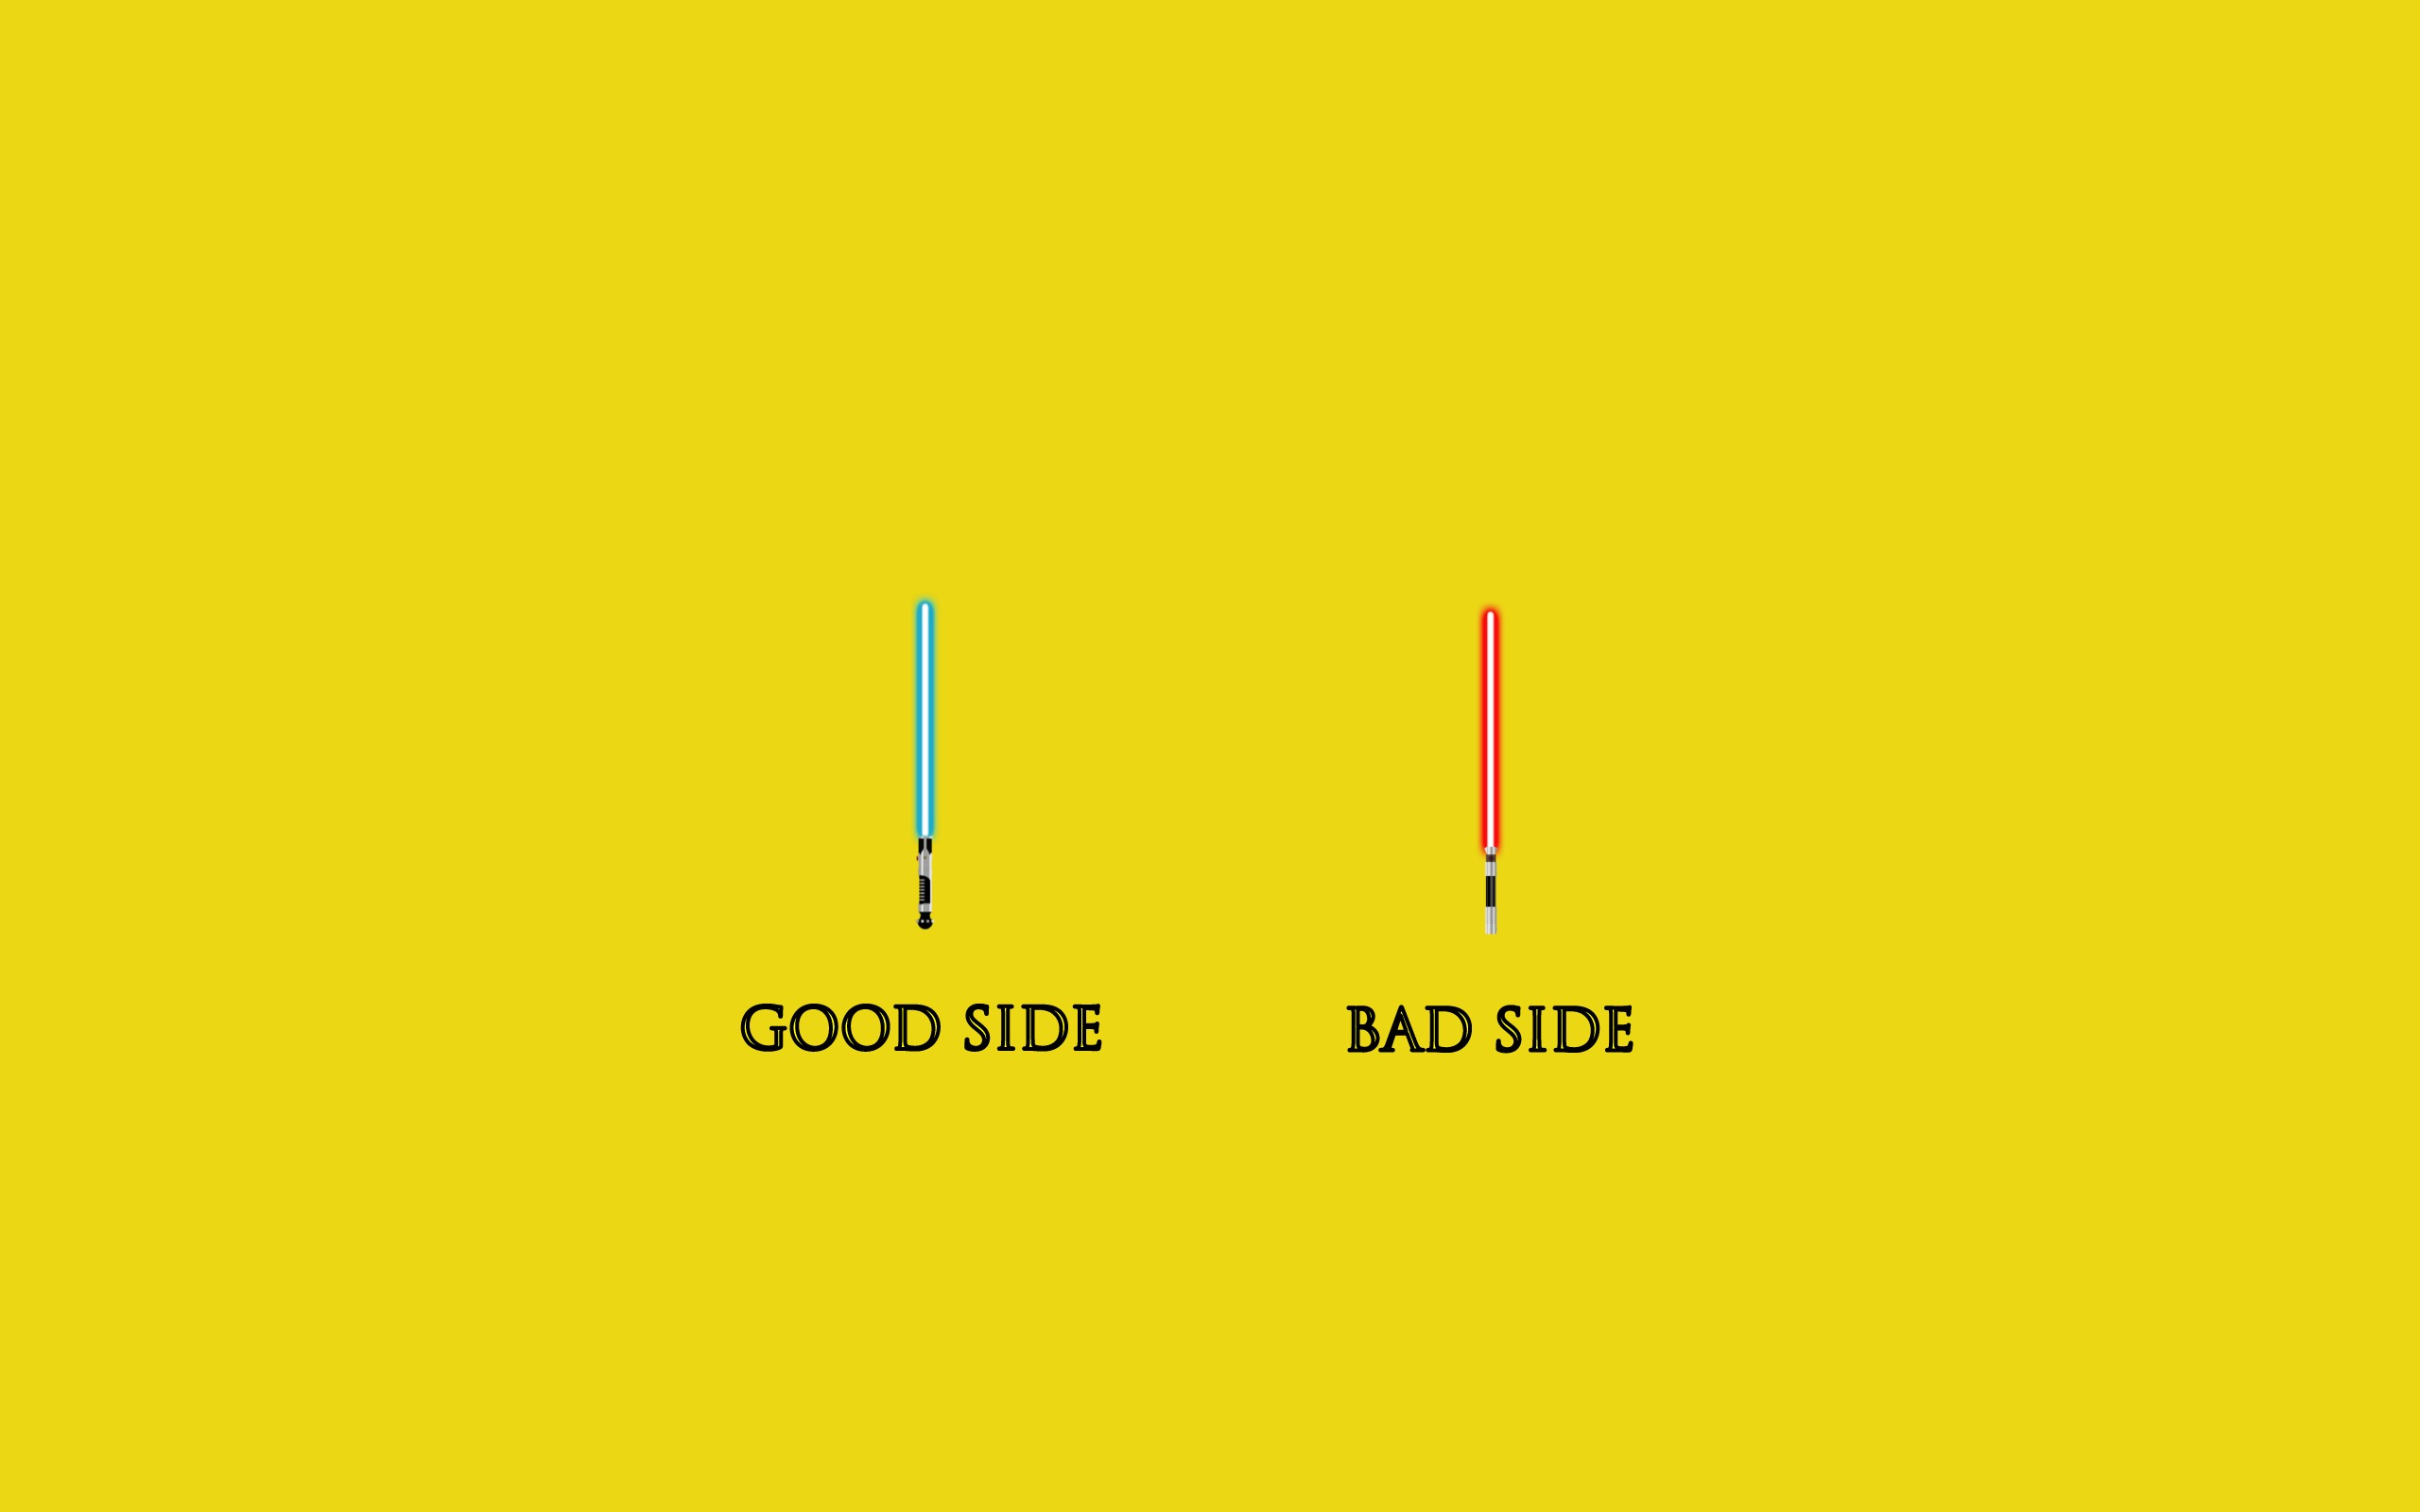 минимализм обои: